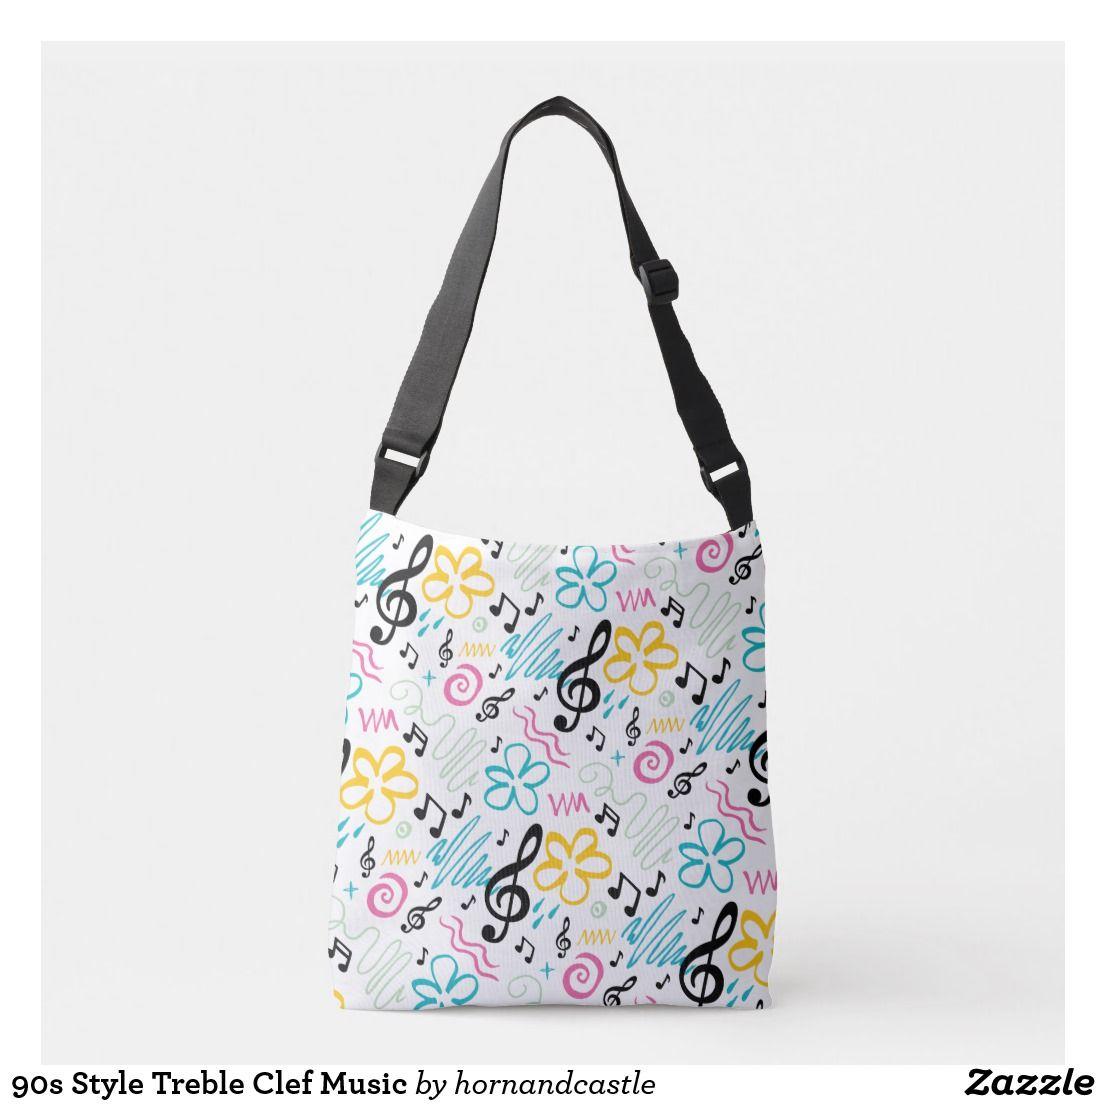 Crossbody music bag  notes purse  music purse  music notes bag  music notes  treble clef music pattern purse